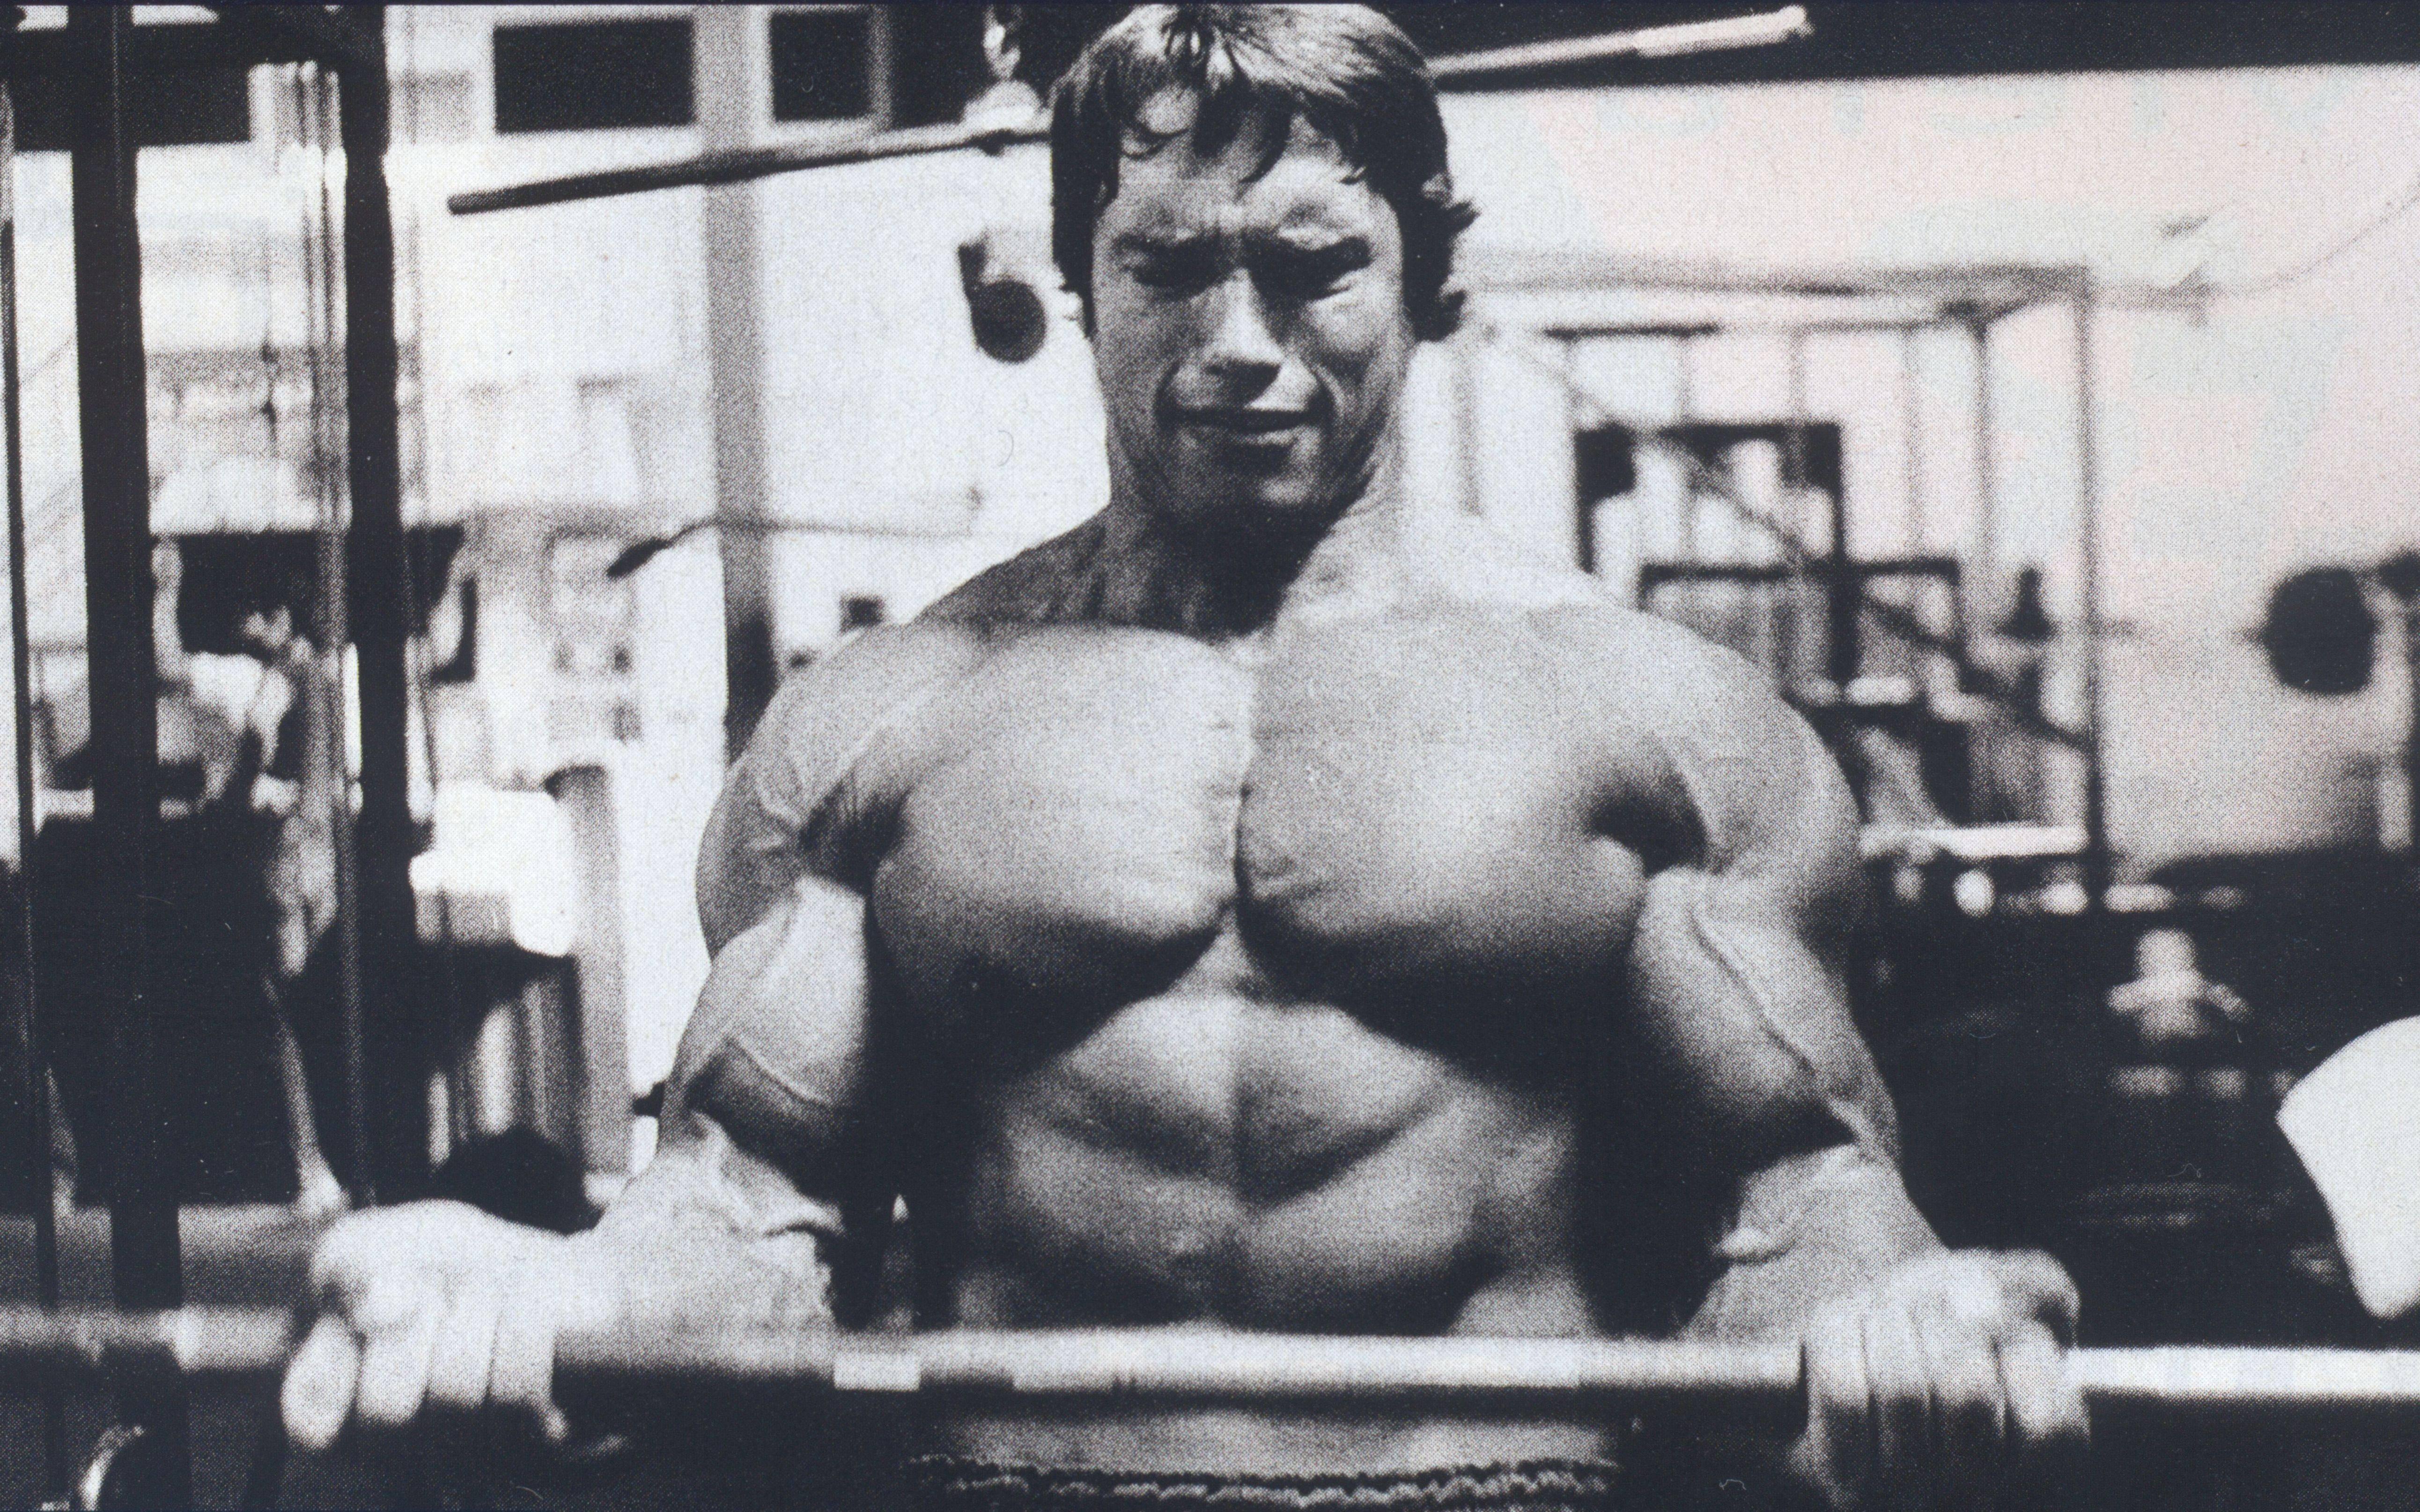 Arnold Motivational Quotes Wallpaper Quotesgram